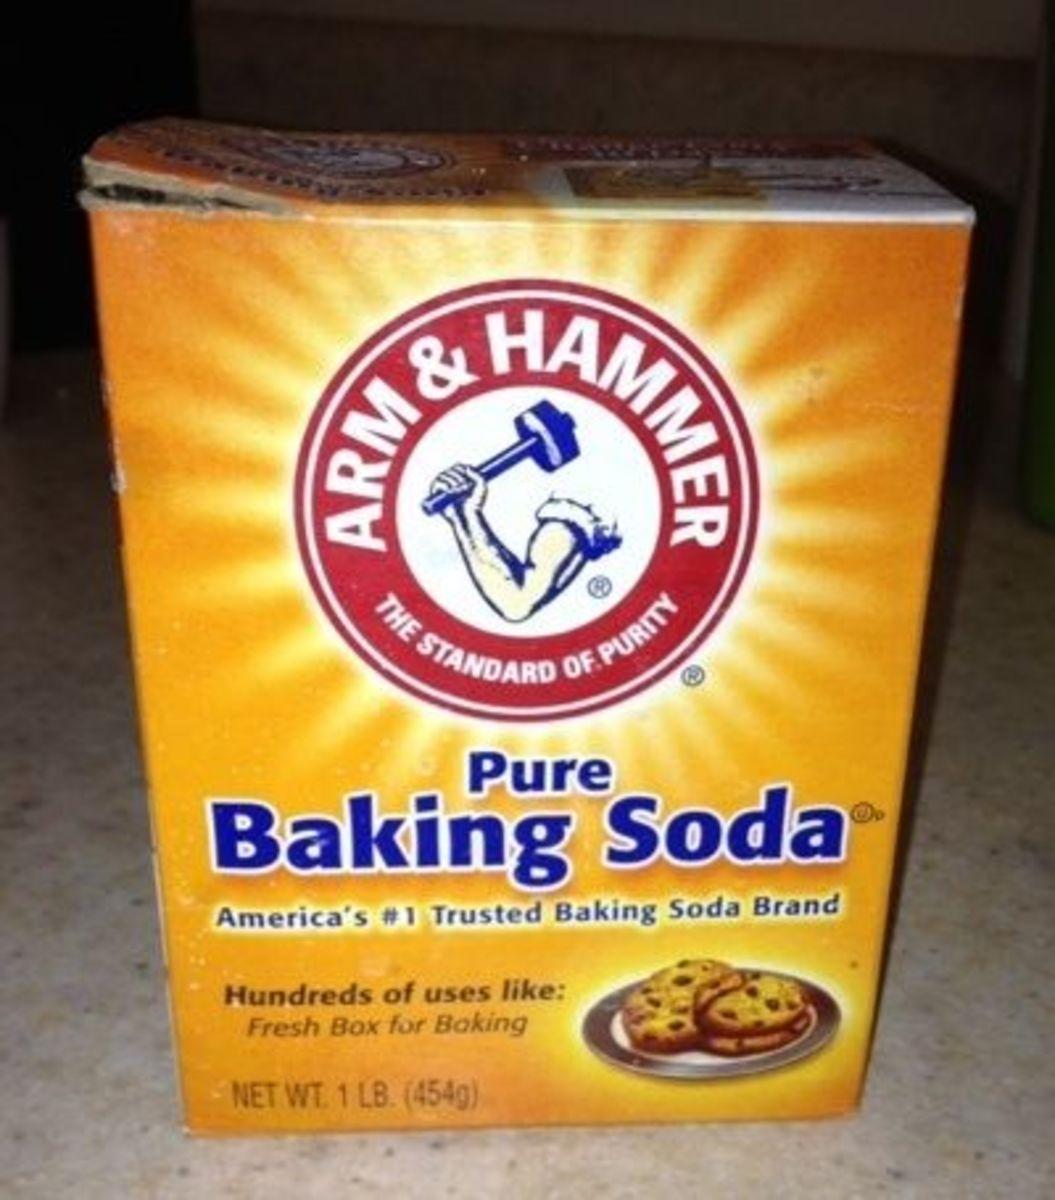 Arm and Hammer Baking Soda from my Fridge